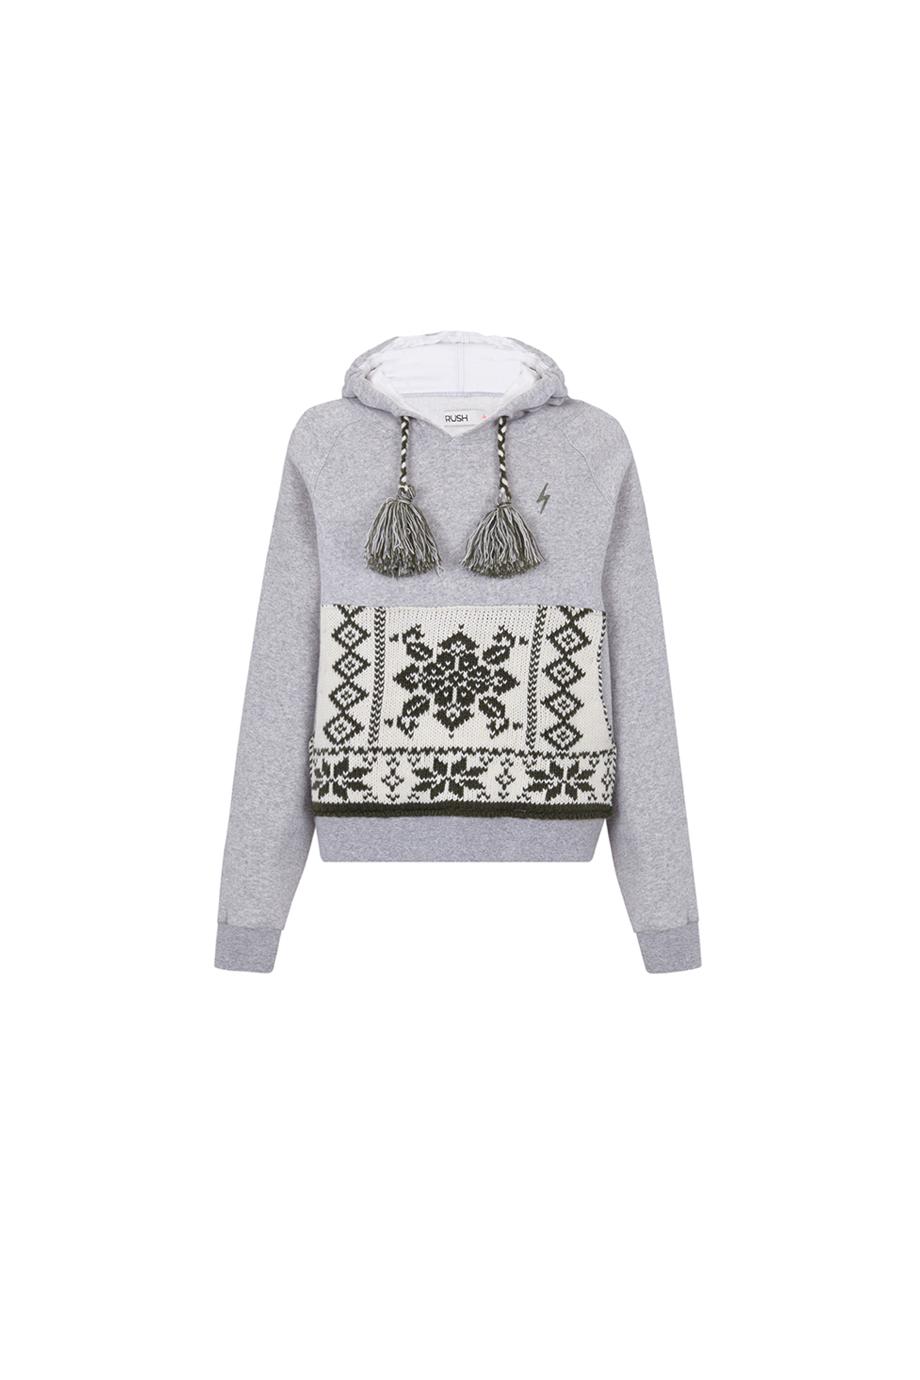 Sudadera RUSH Gray sweatshirt chicas by GUTS&LOVE